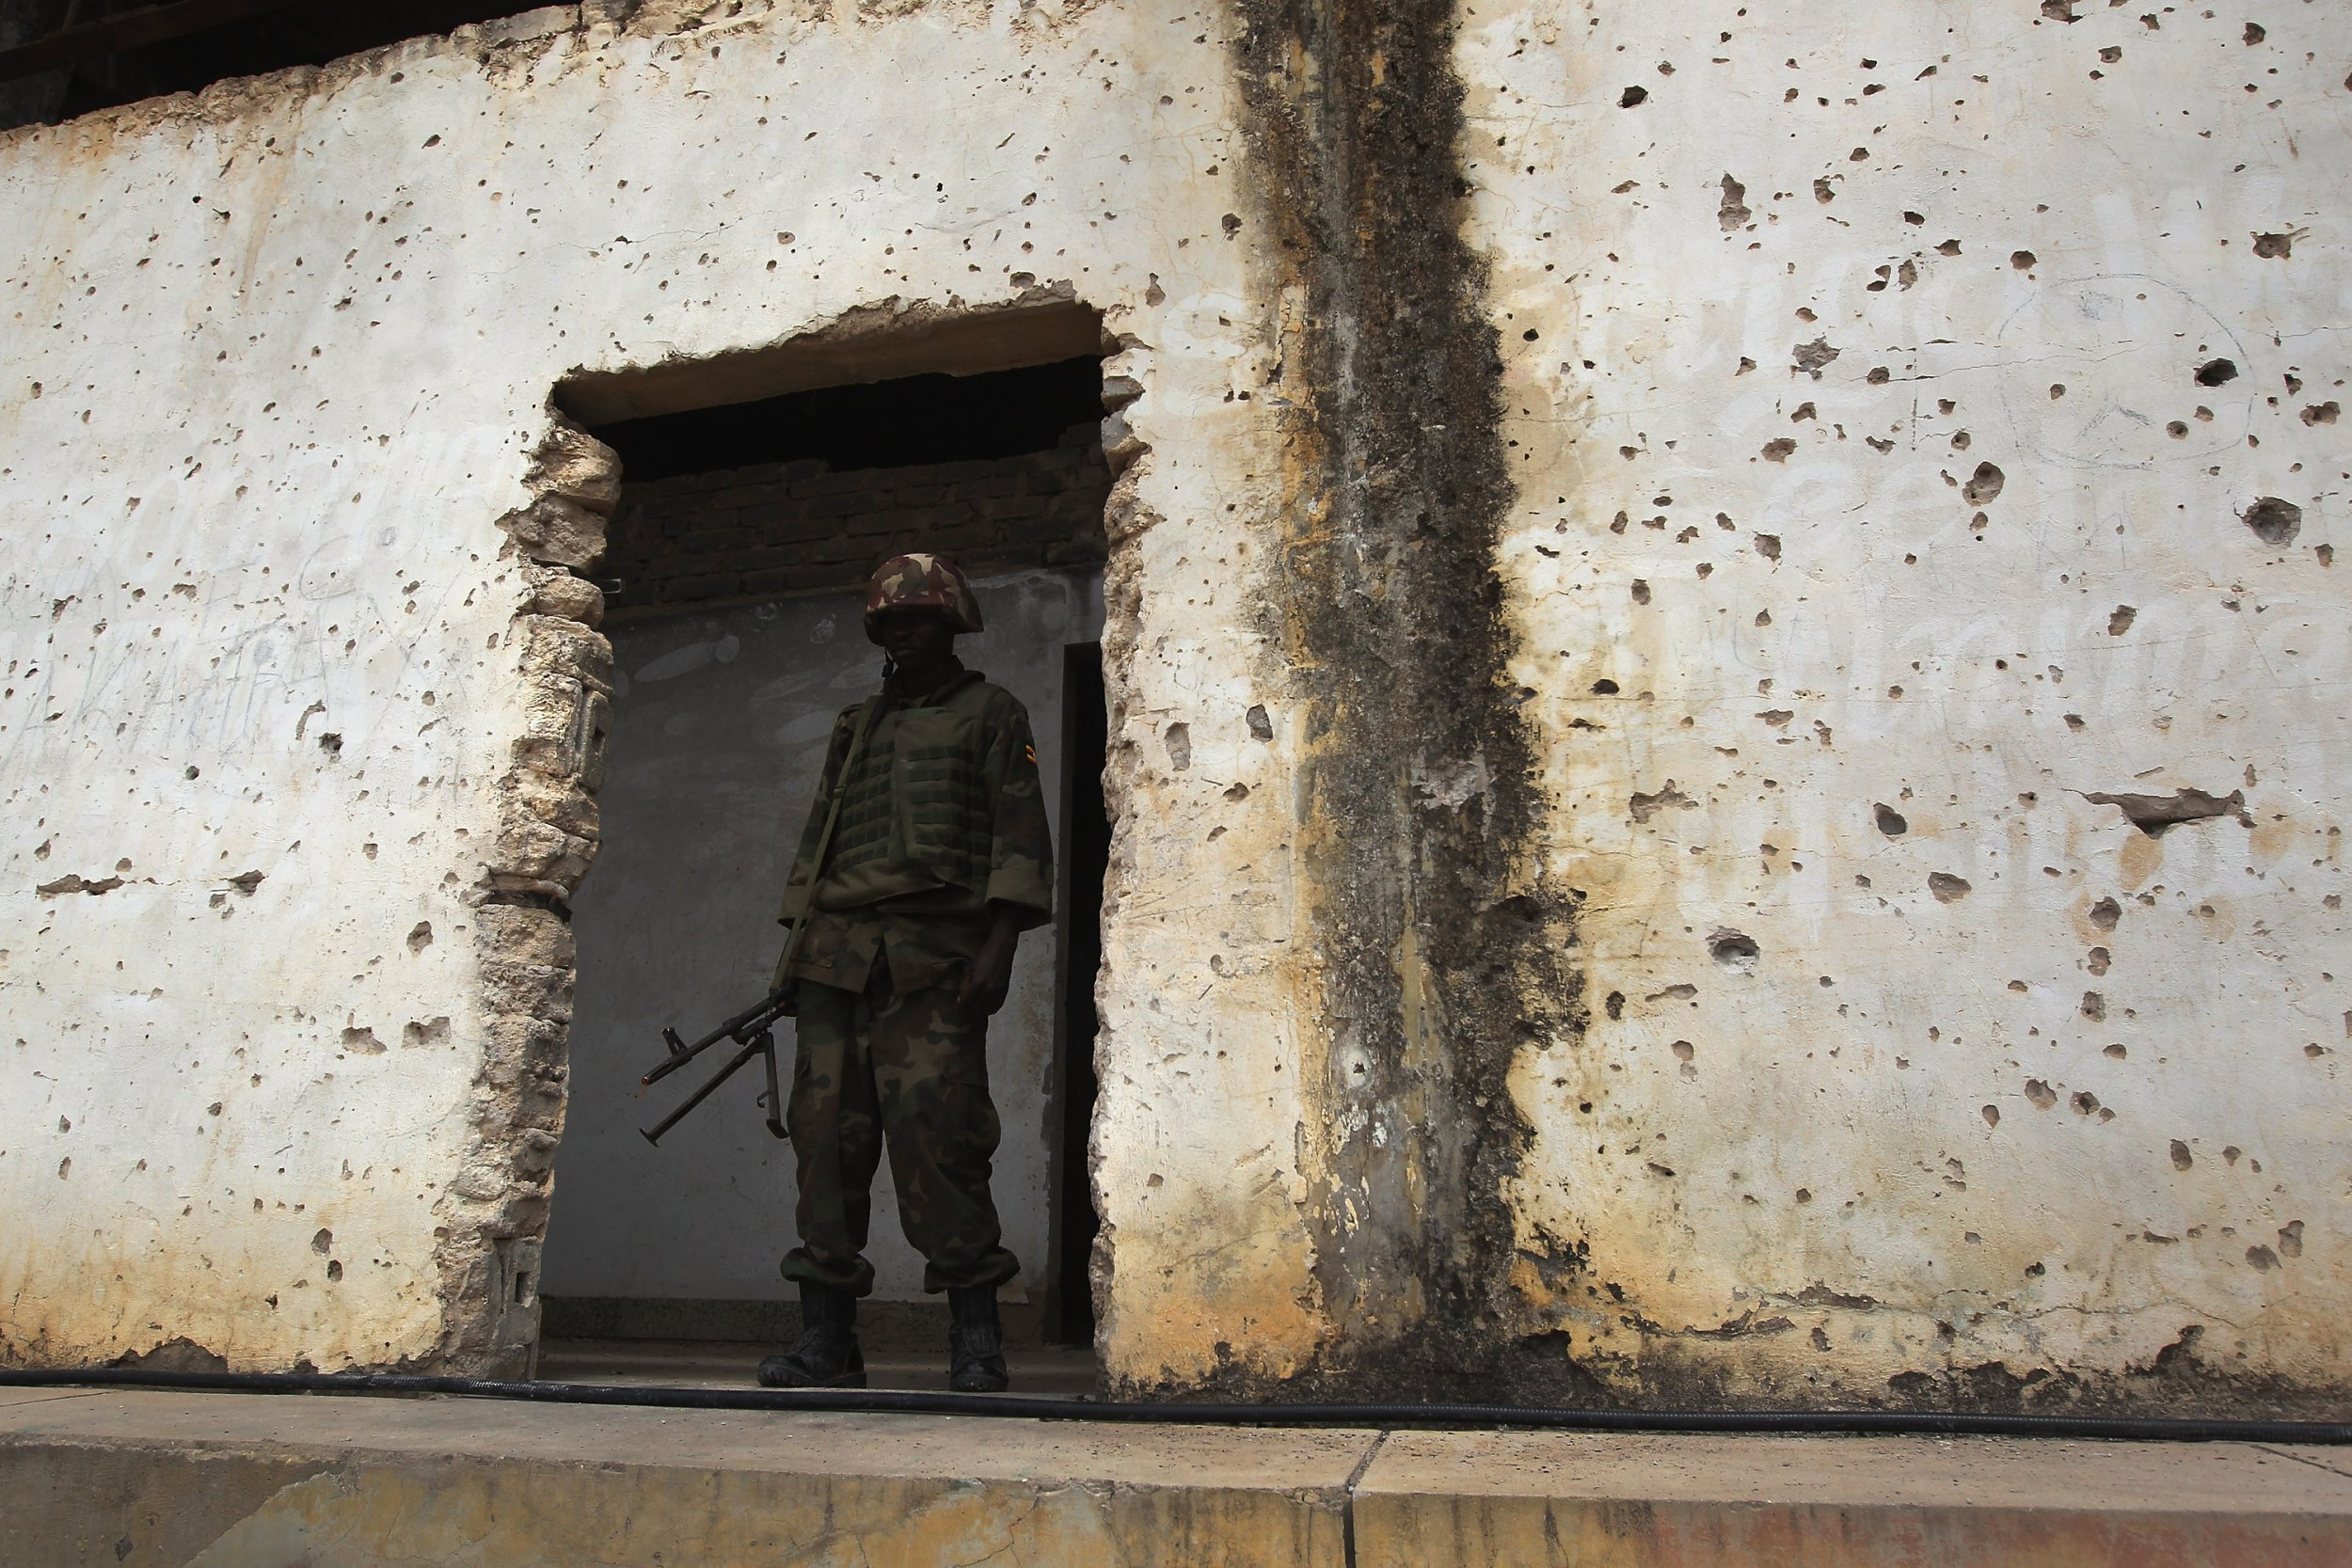 AMISOM soldier in Somalia.